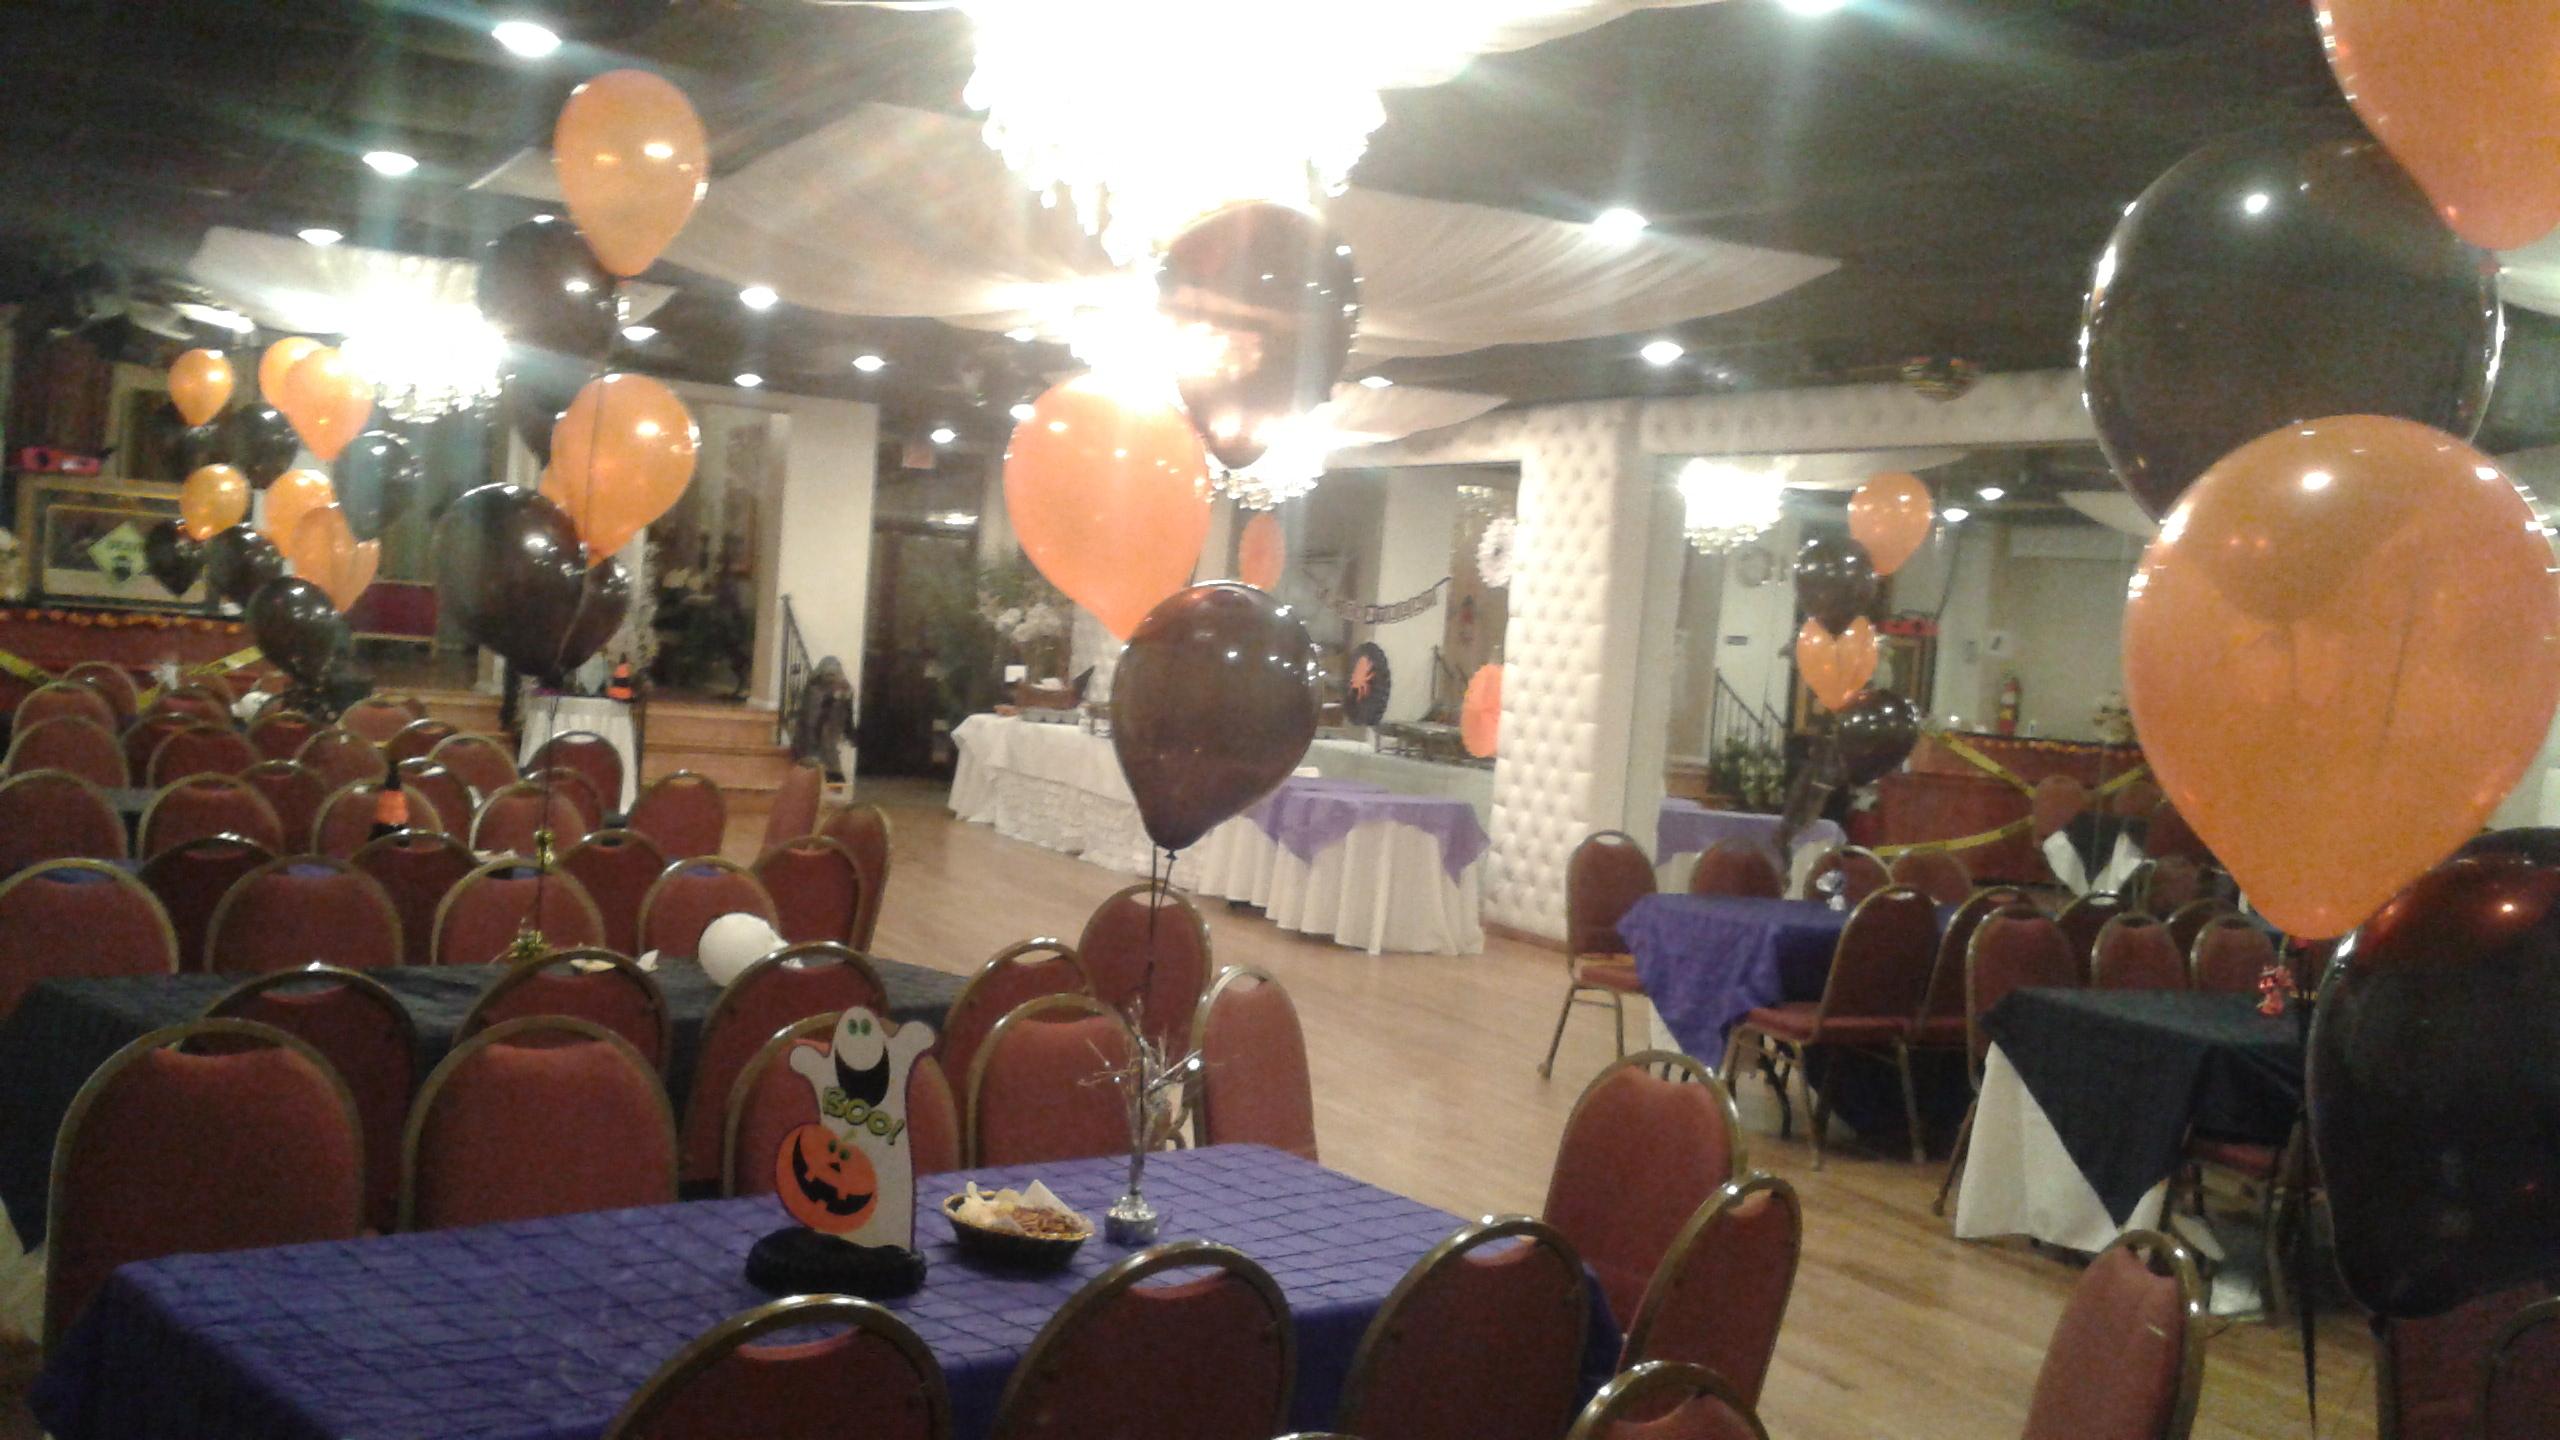 Dance Club International: Queens Catering Halls image 5